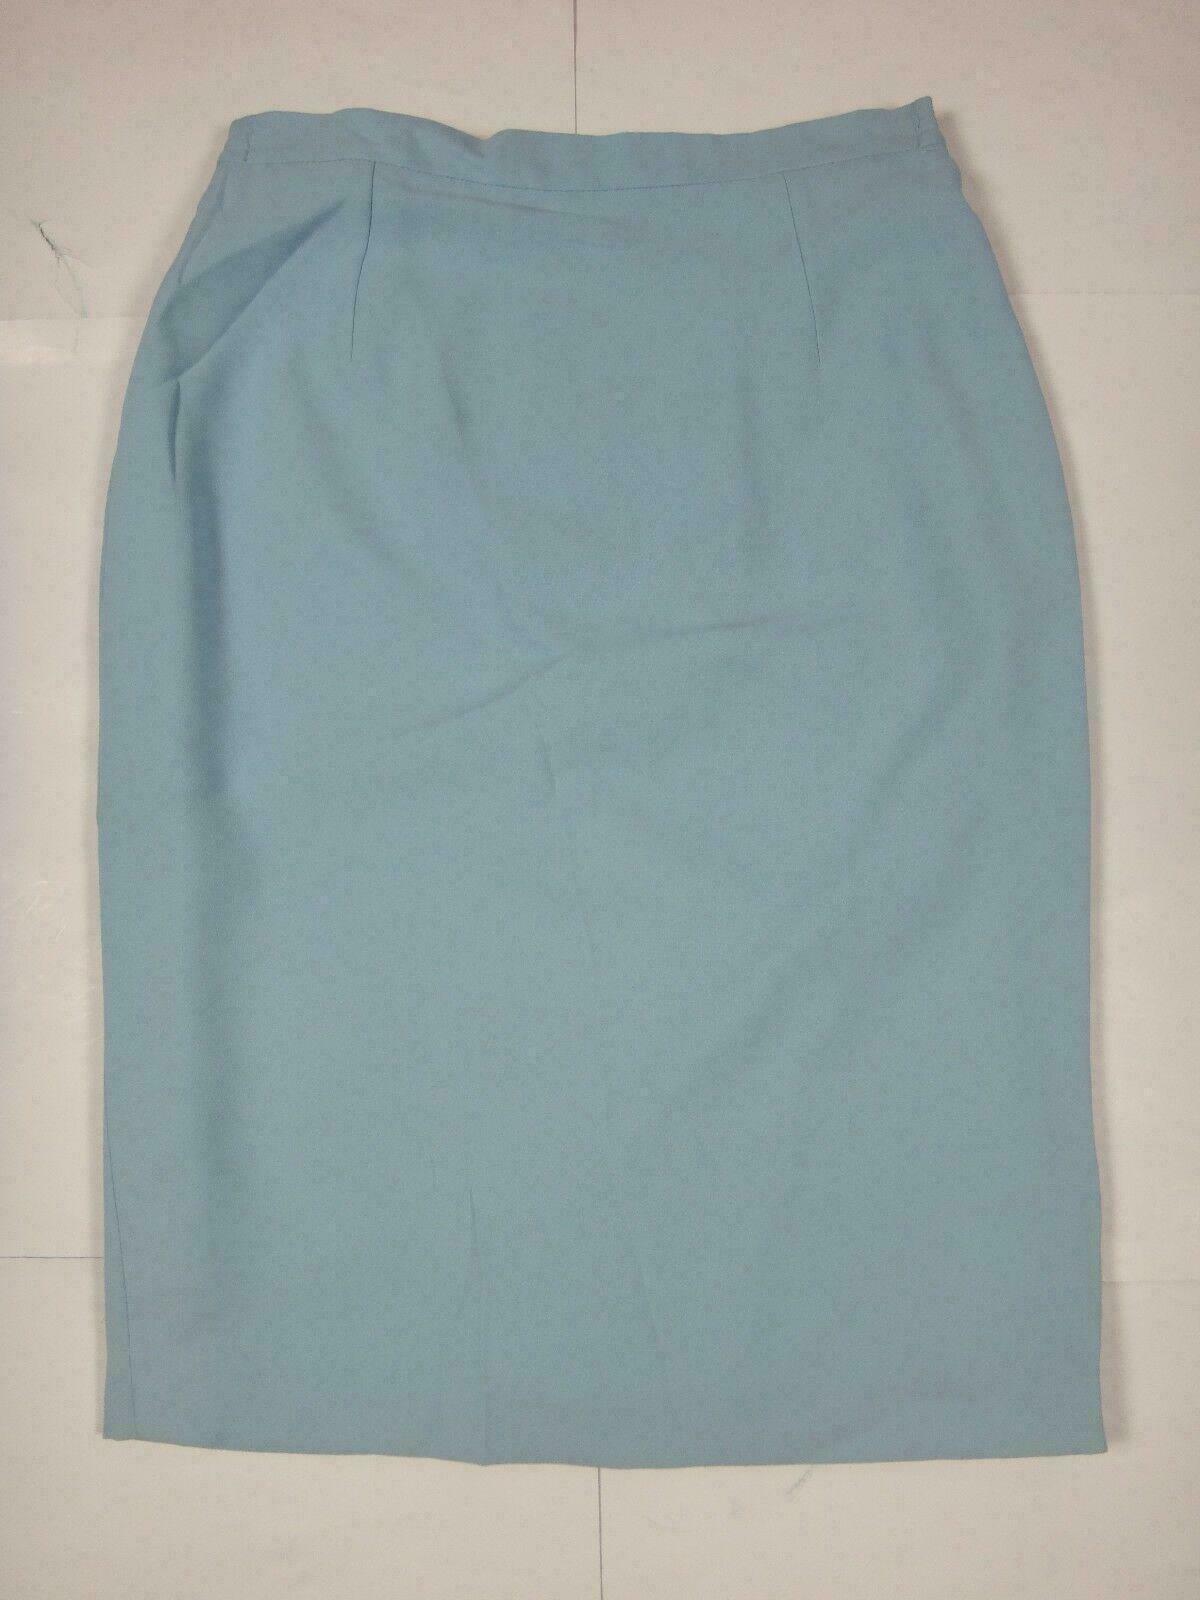 12596 Womens Skirt DEVERNOIS Size 38 Light Blue